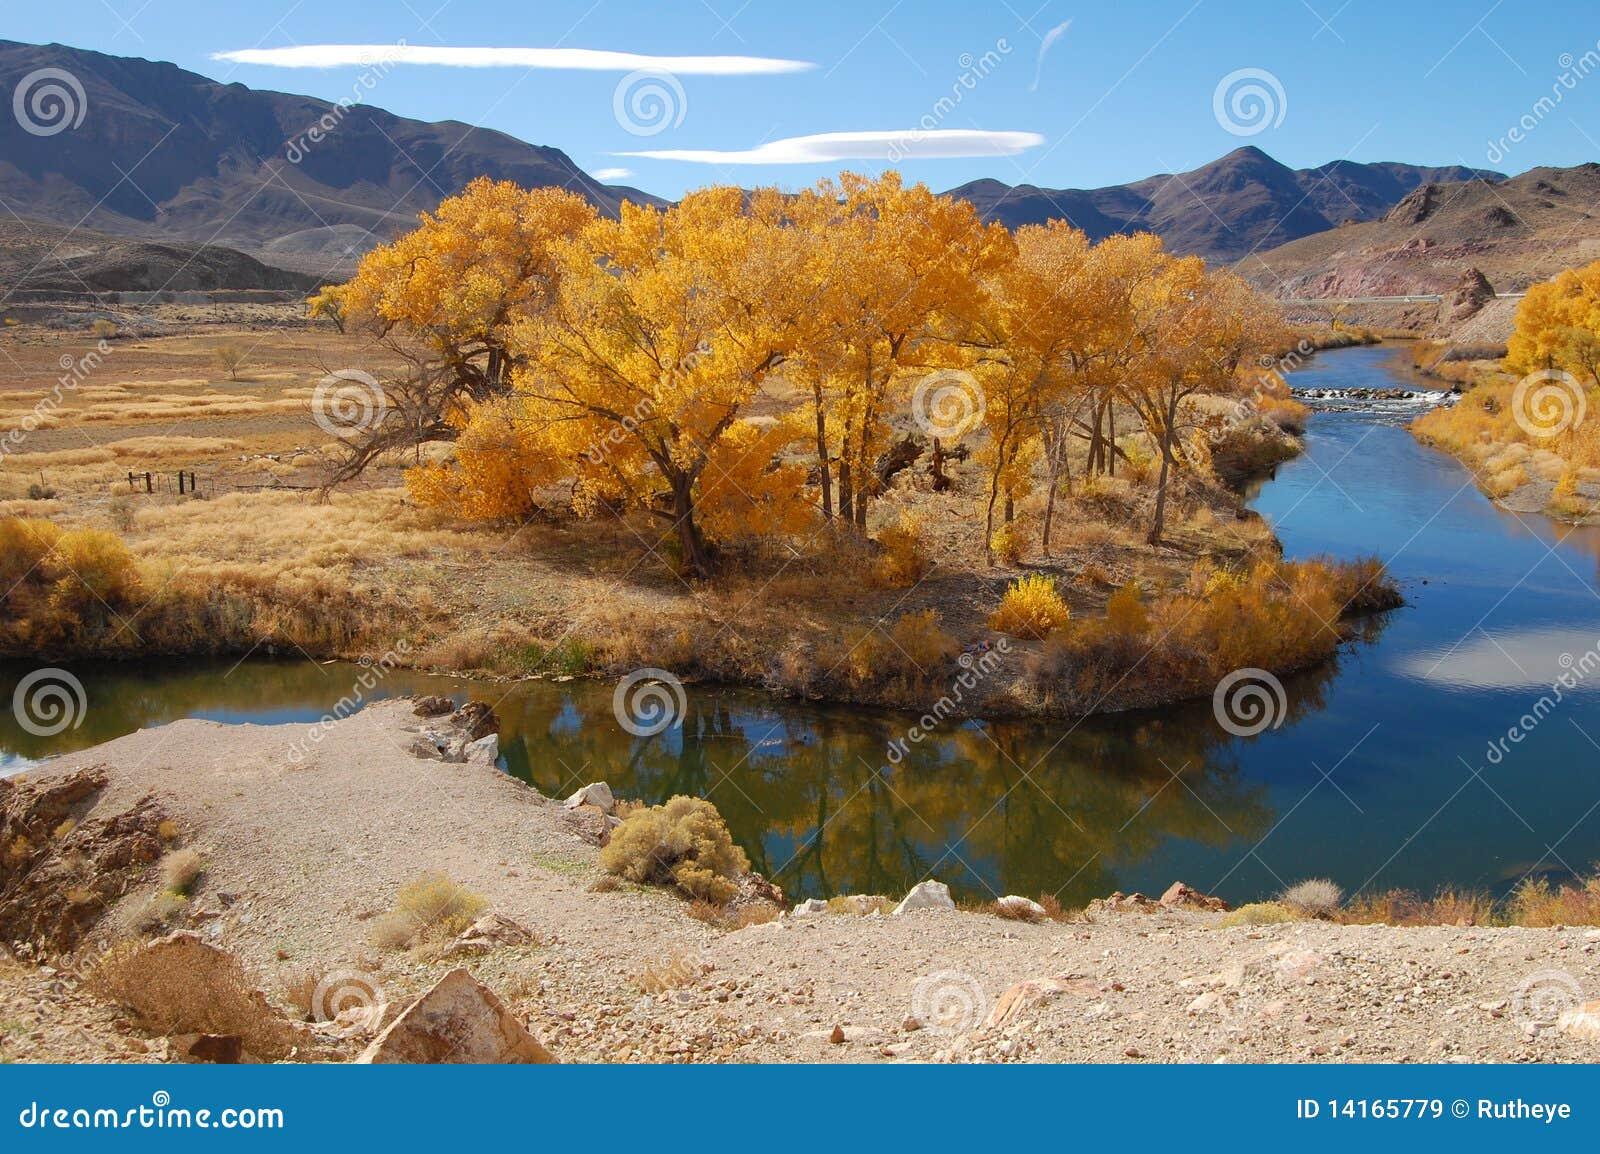 Cottonwoods in Nevada